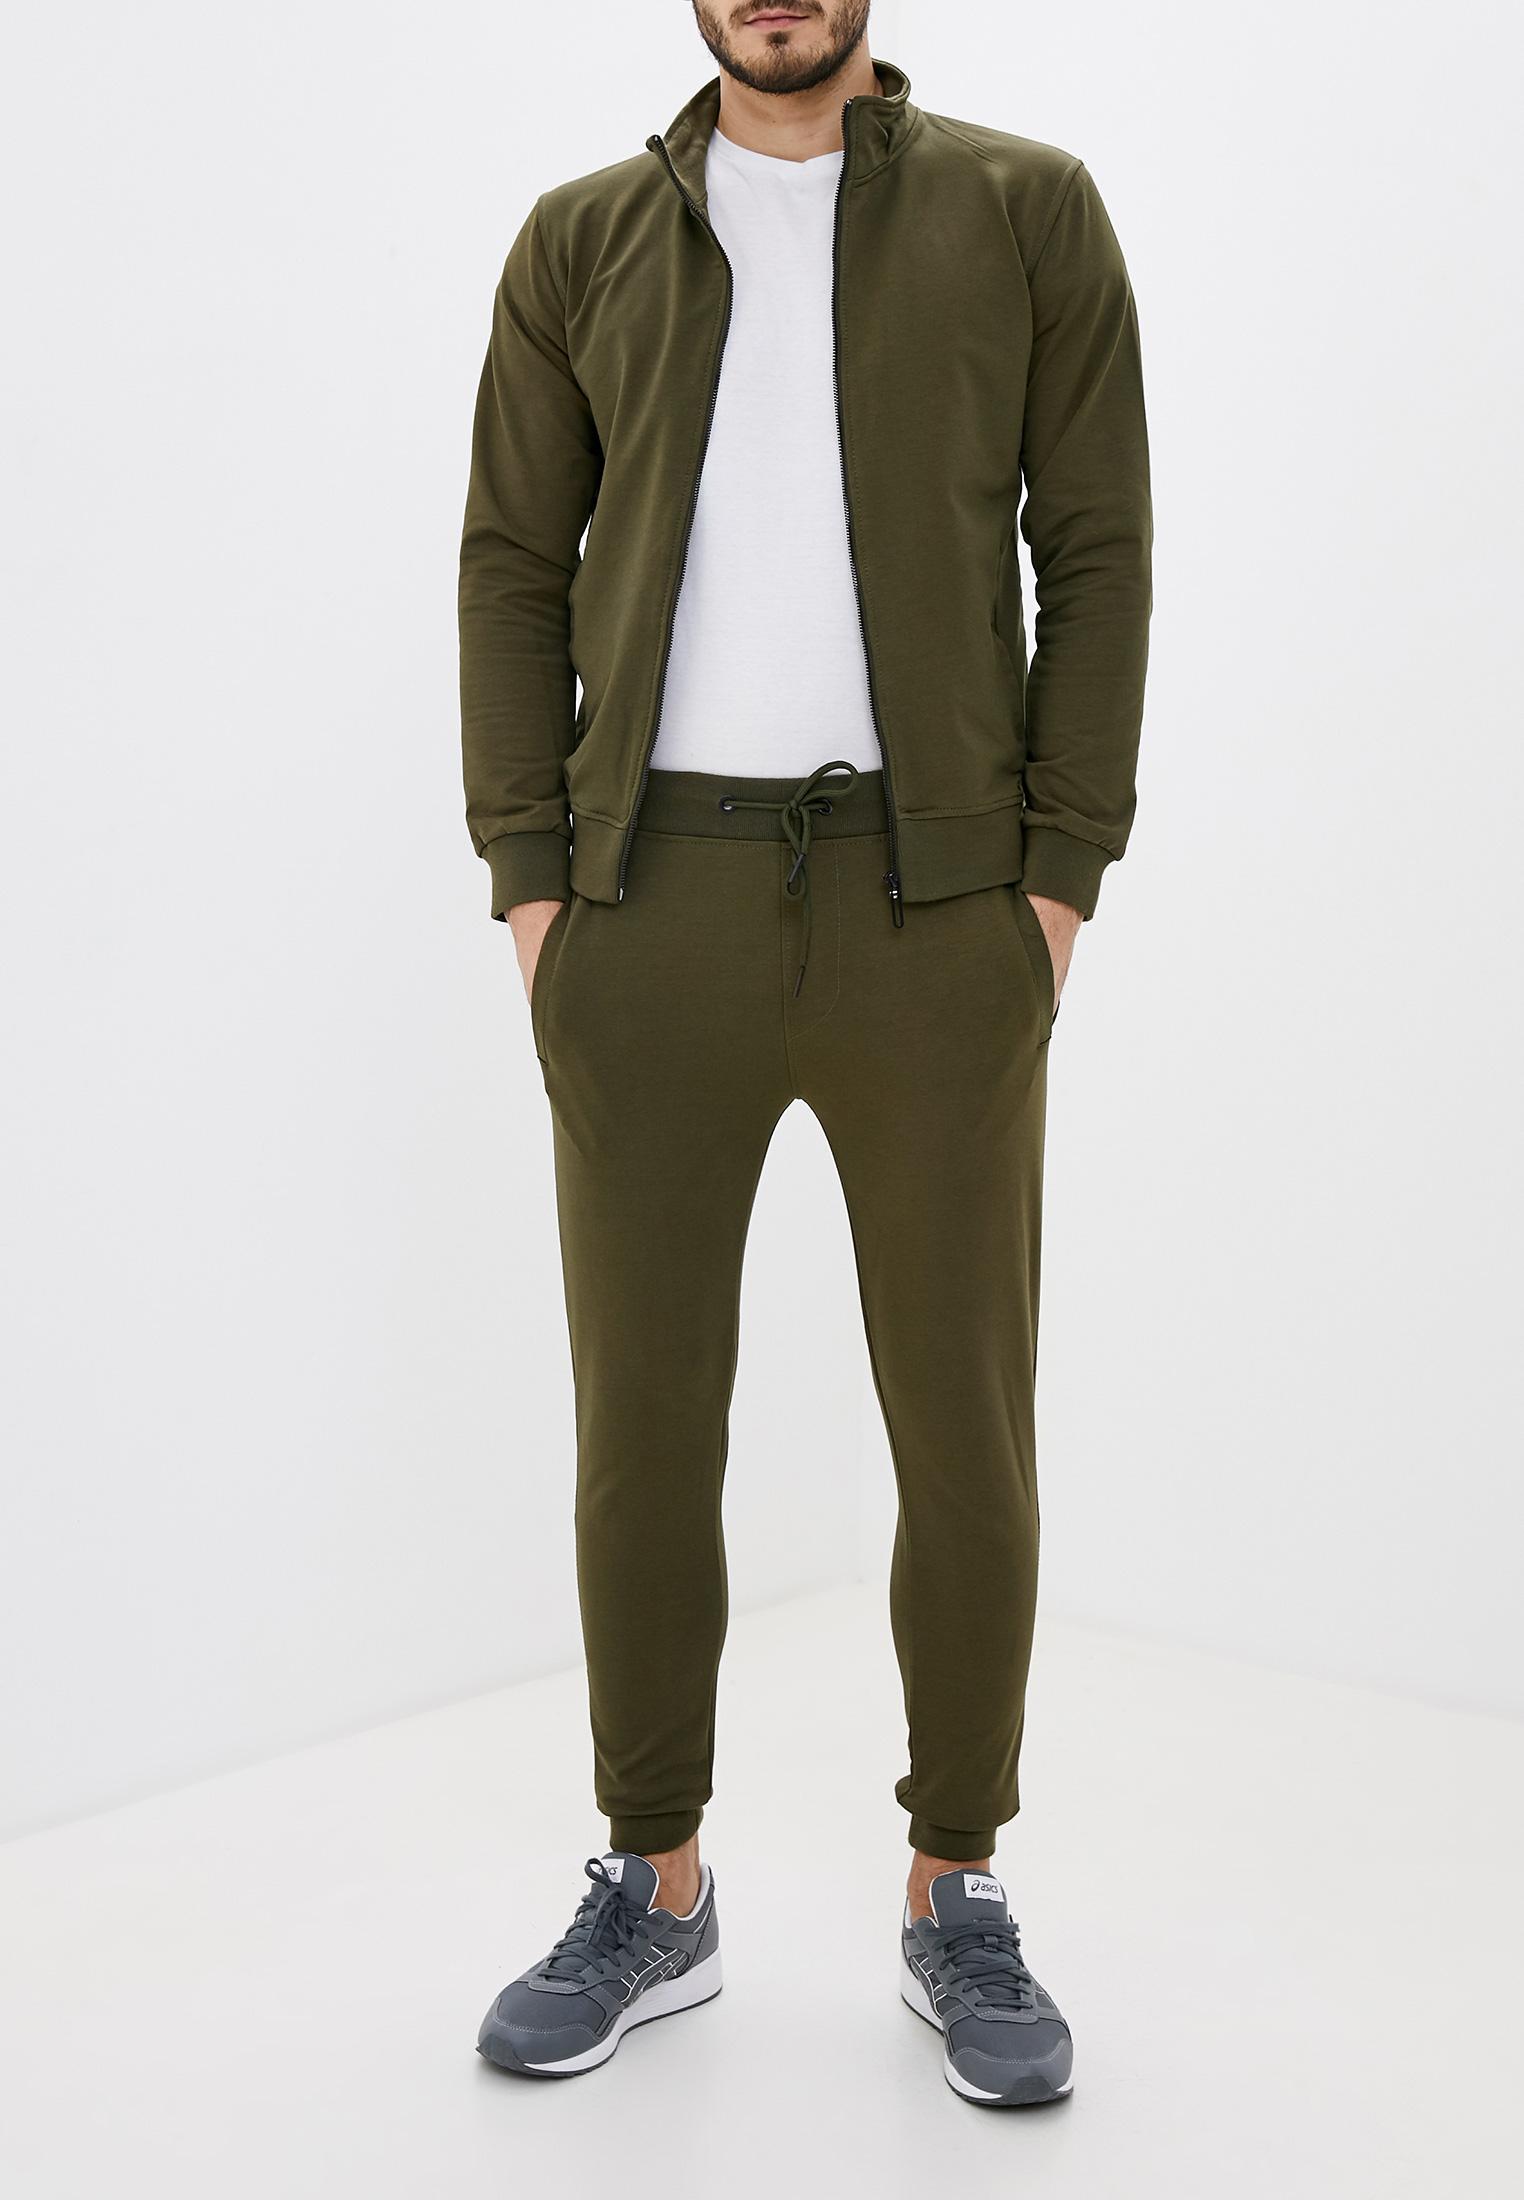 Спортивный костюм Jackets Industry T-2220